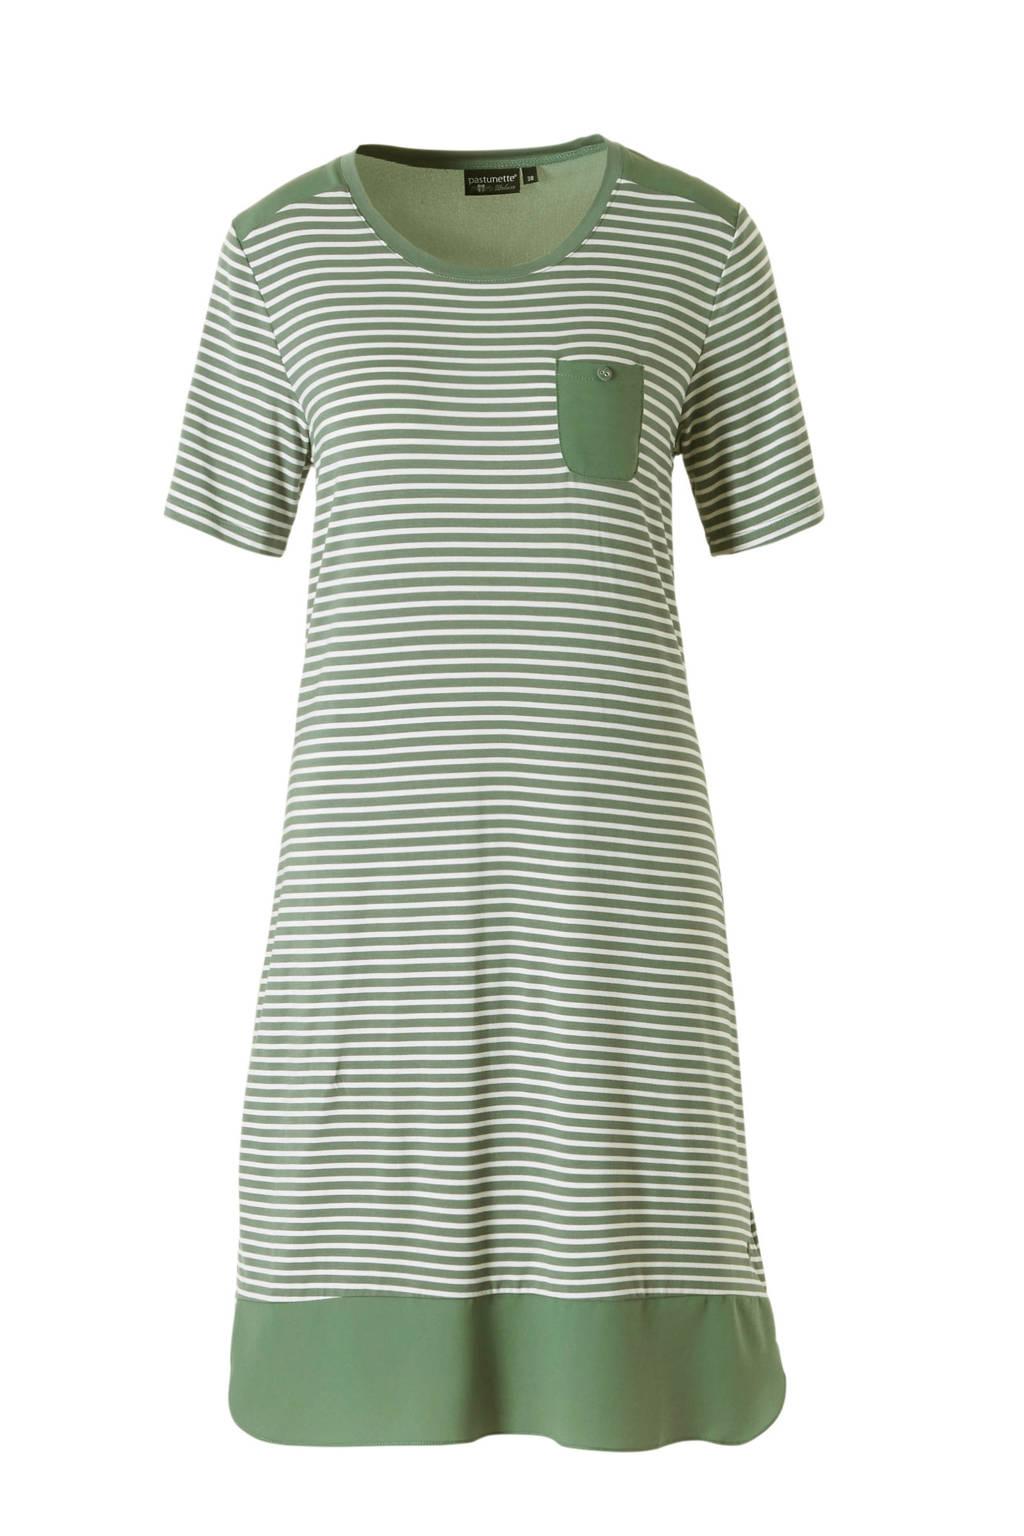 Pastunette nachthemd in all over print groen, Groen/wit